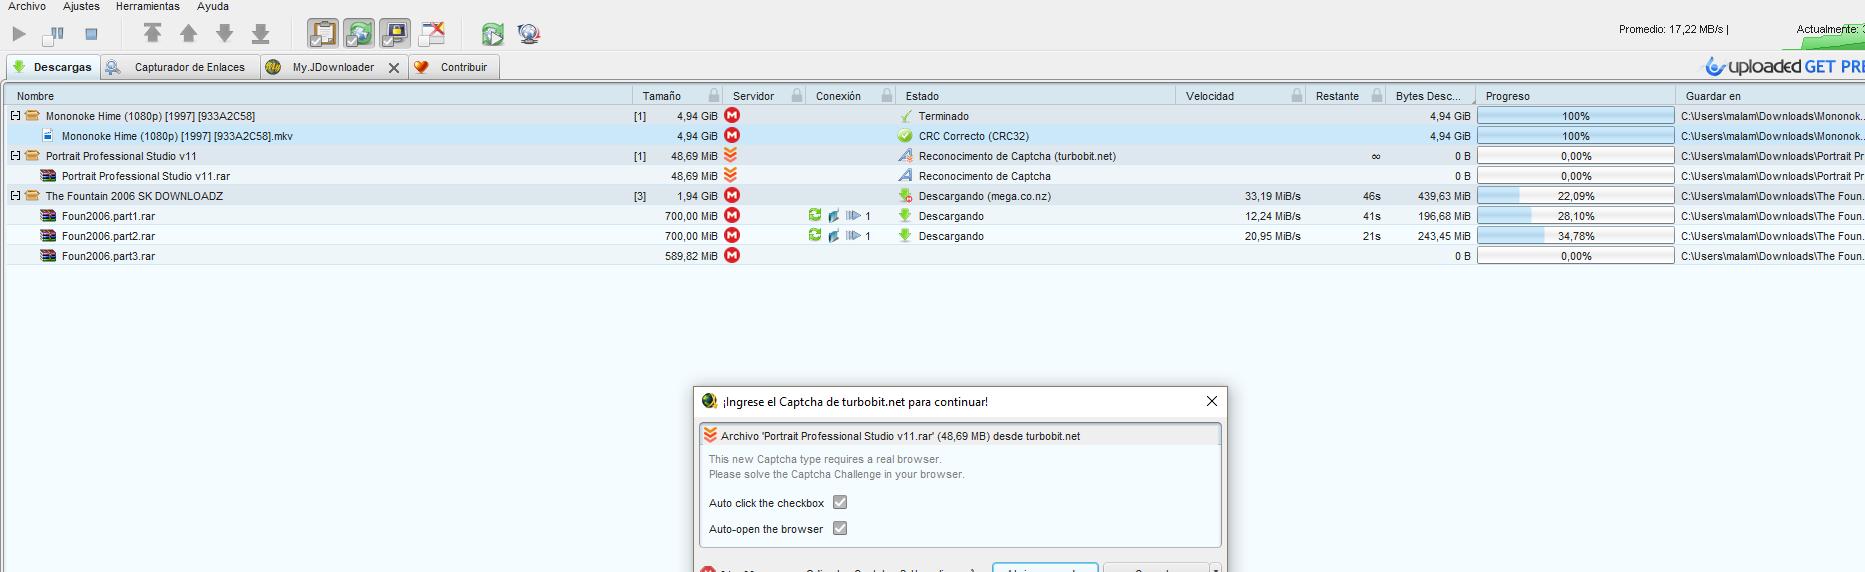 descargar IDM v6.38 - jdownloader 2 + cuentas premium ...